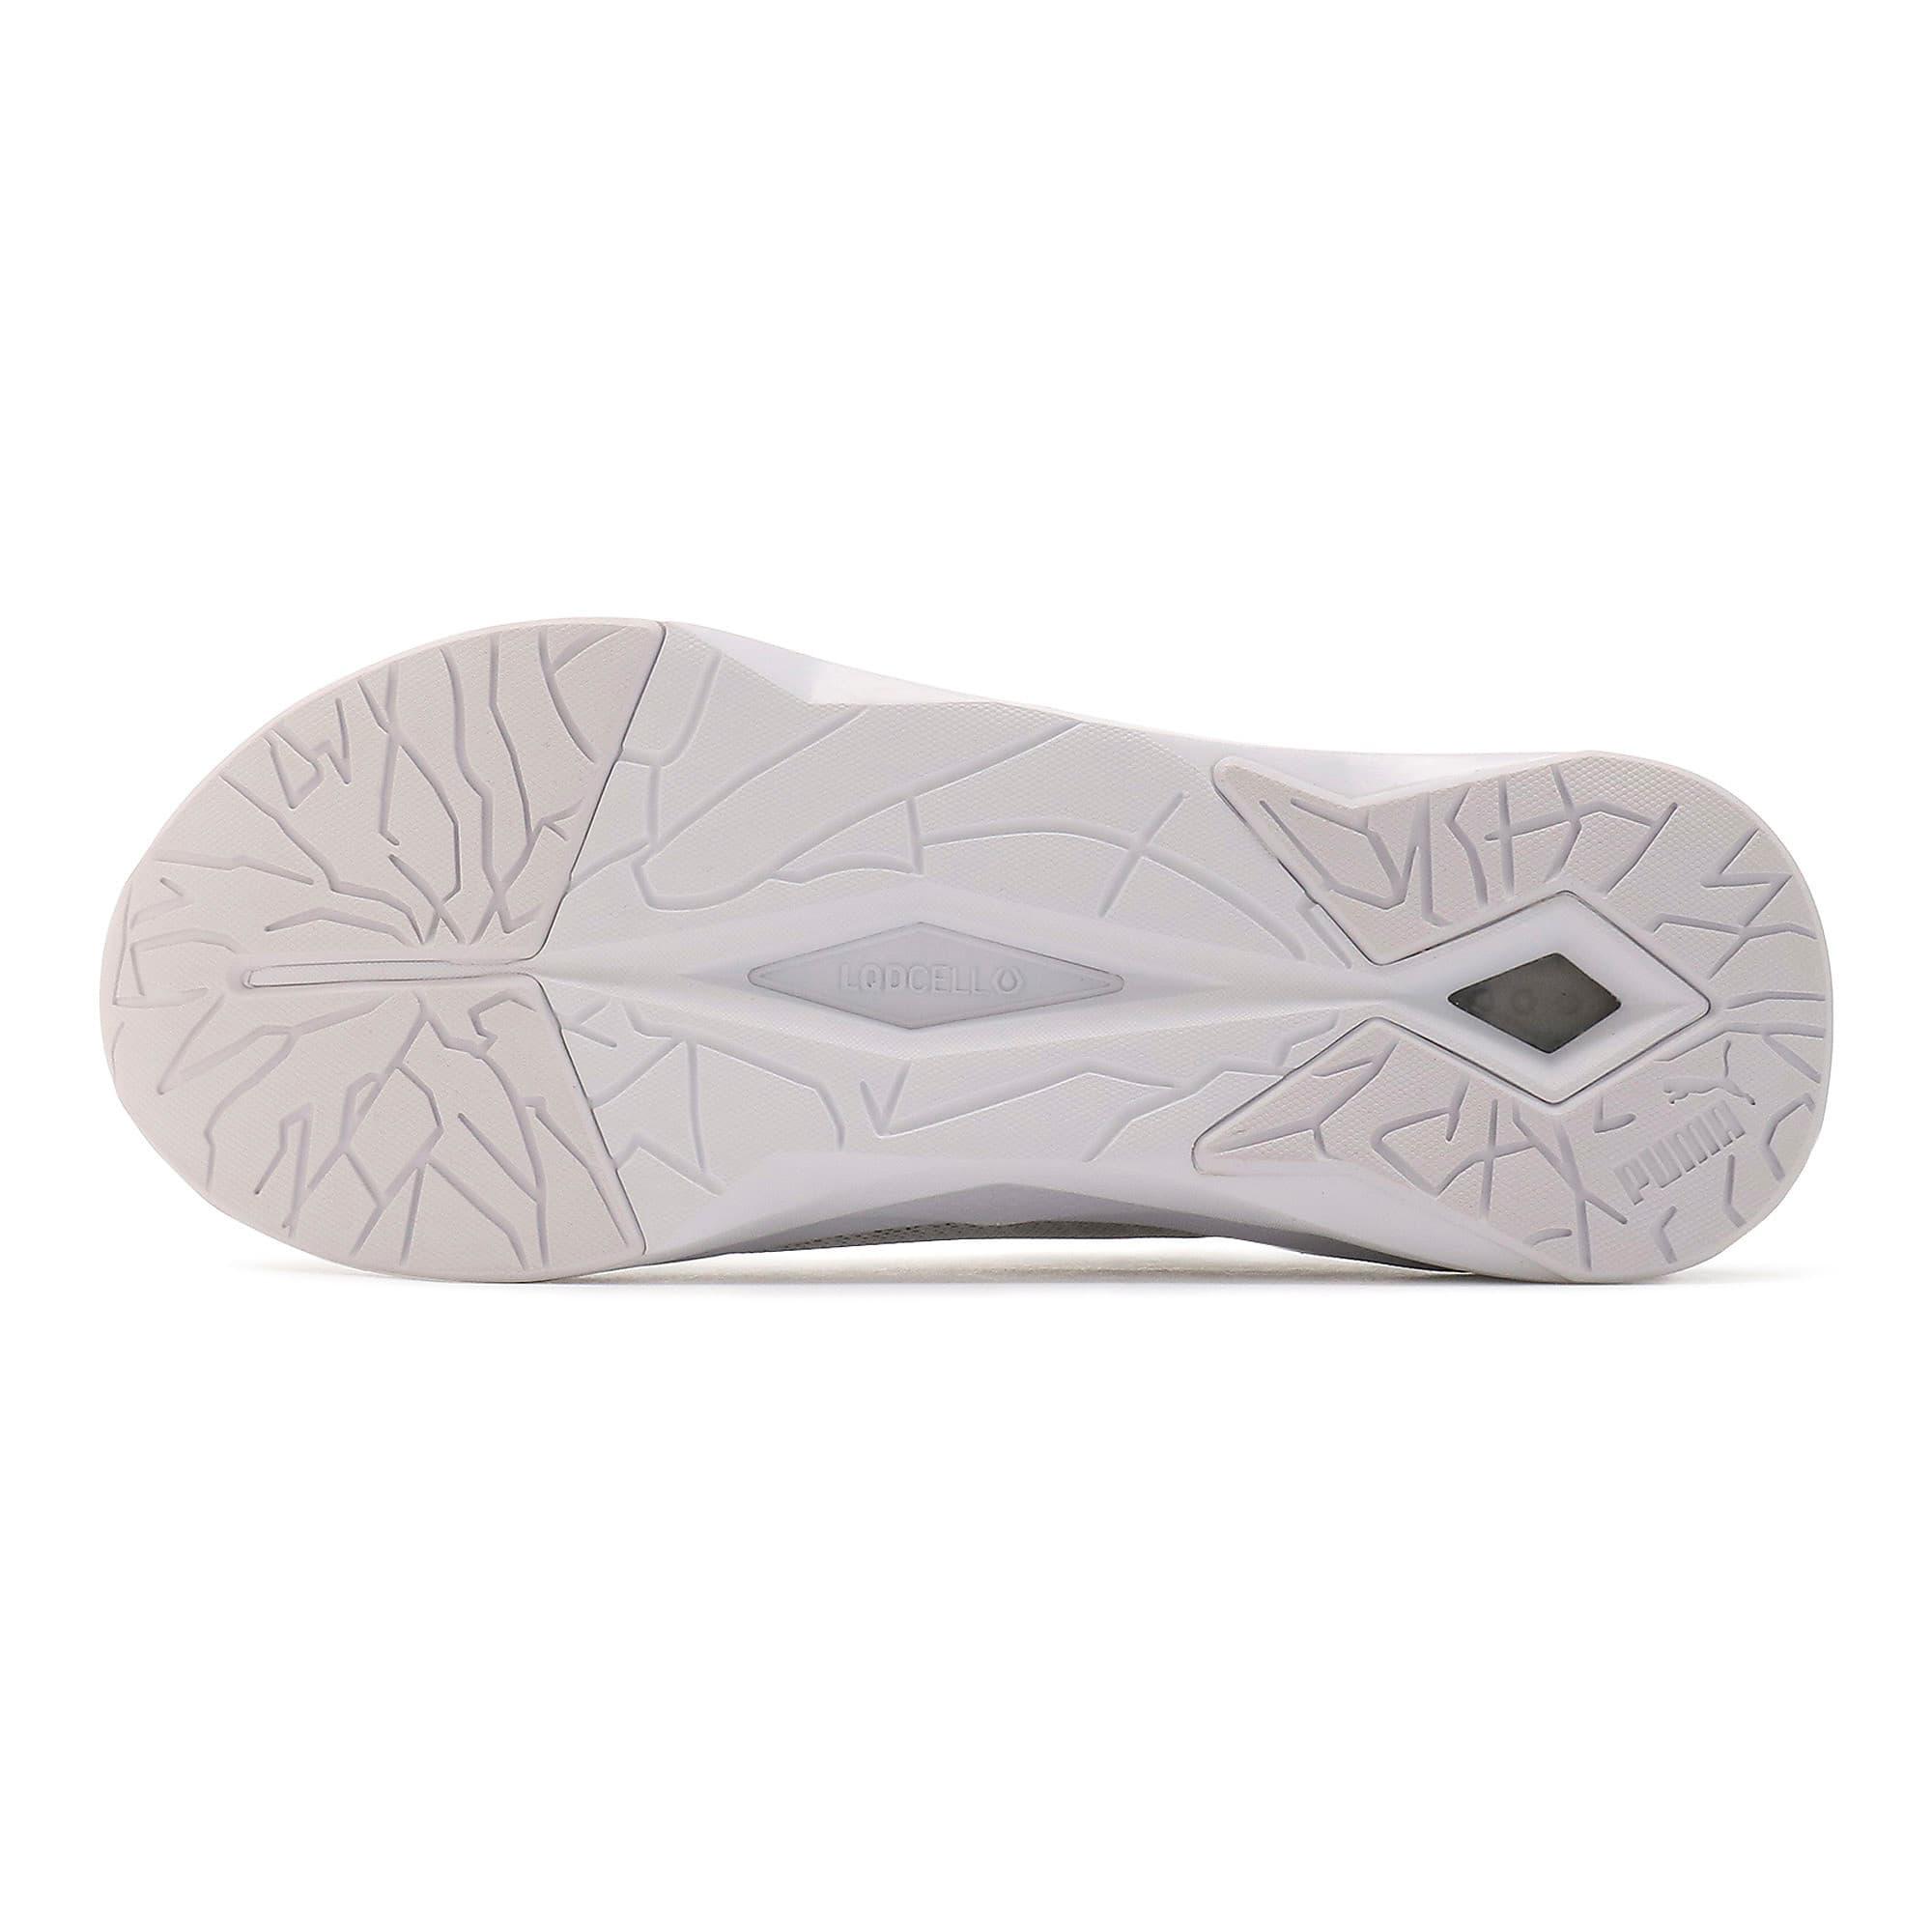 Thumbnail 4 of LQDCELL Shatter XT Luster Women's Training Shoes, Puma White-Puma White, medium